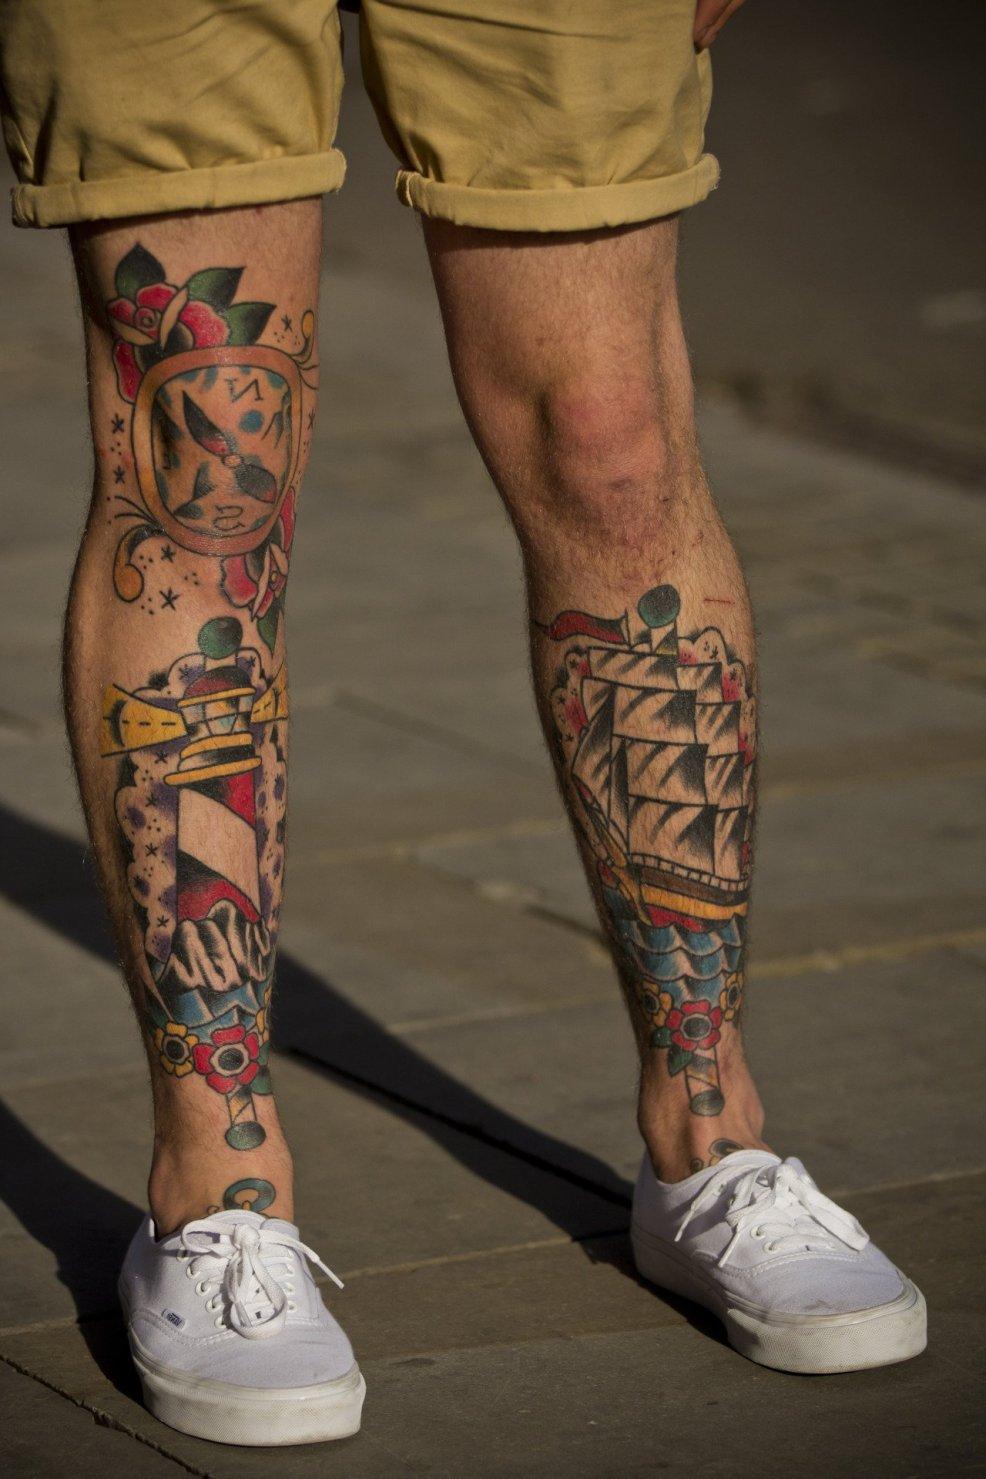 мужские наколки на ноги тату на ногах 1 в тату эскизах рисуем на